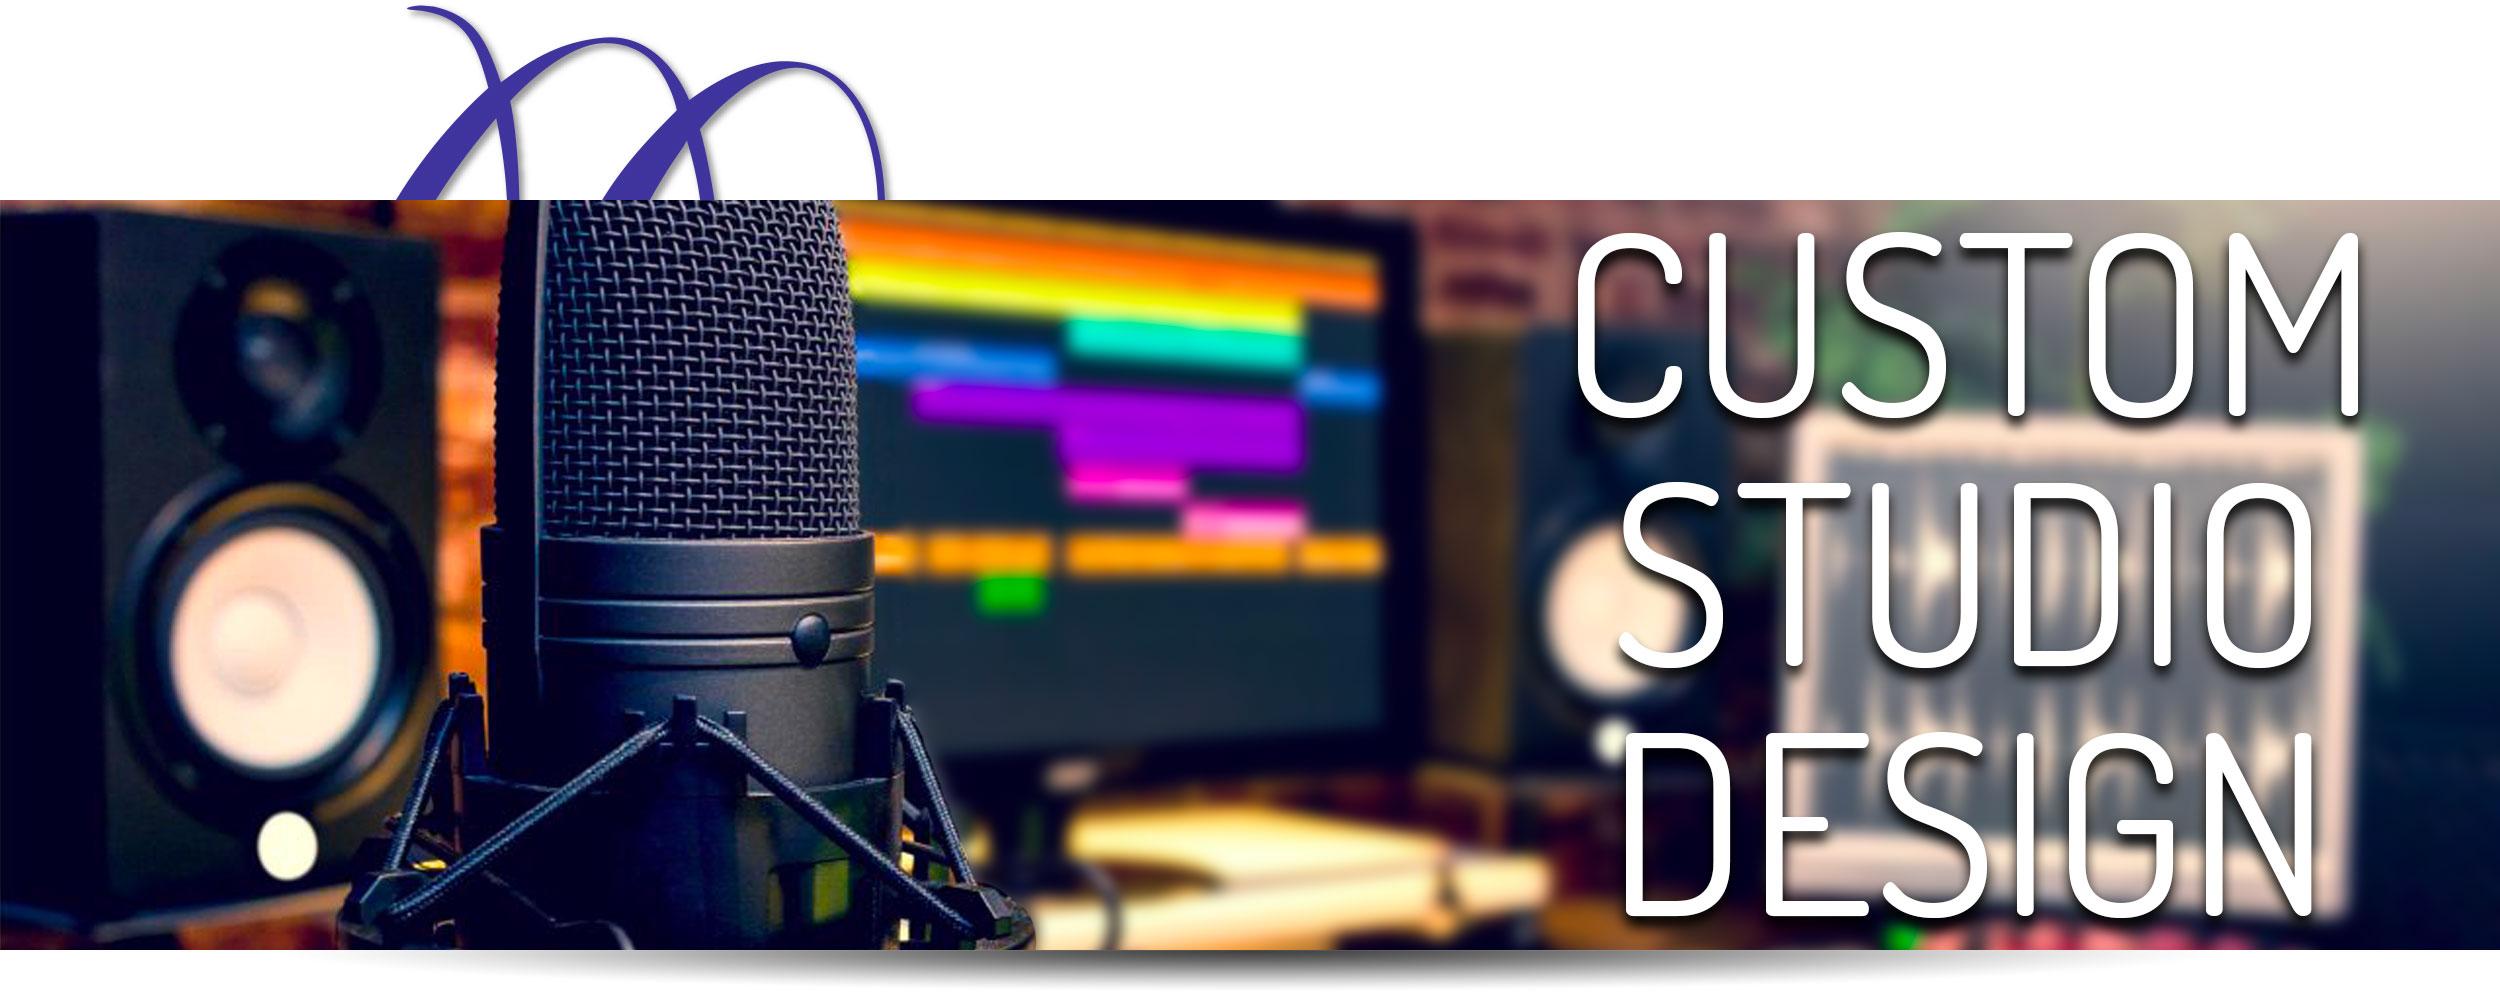 Custom Studio Design For Home Recording Studio